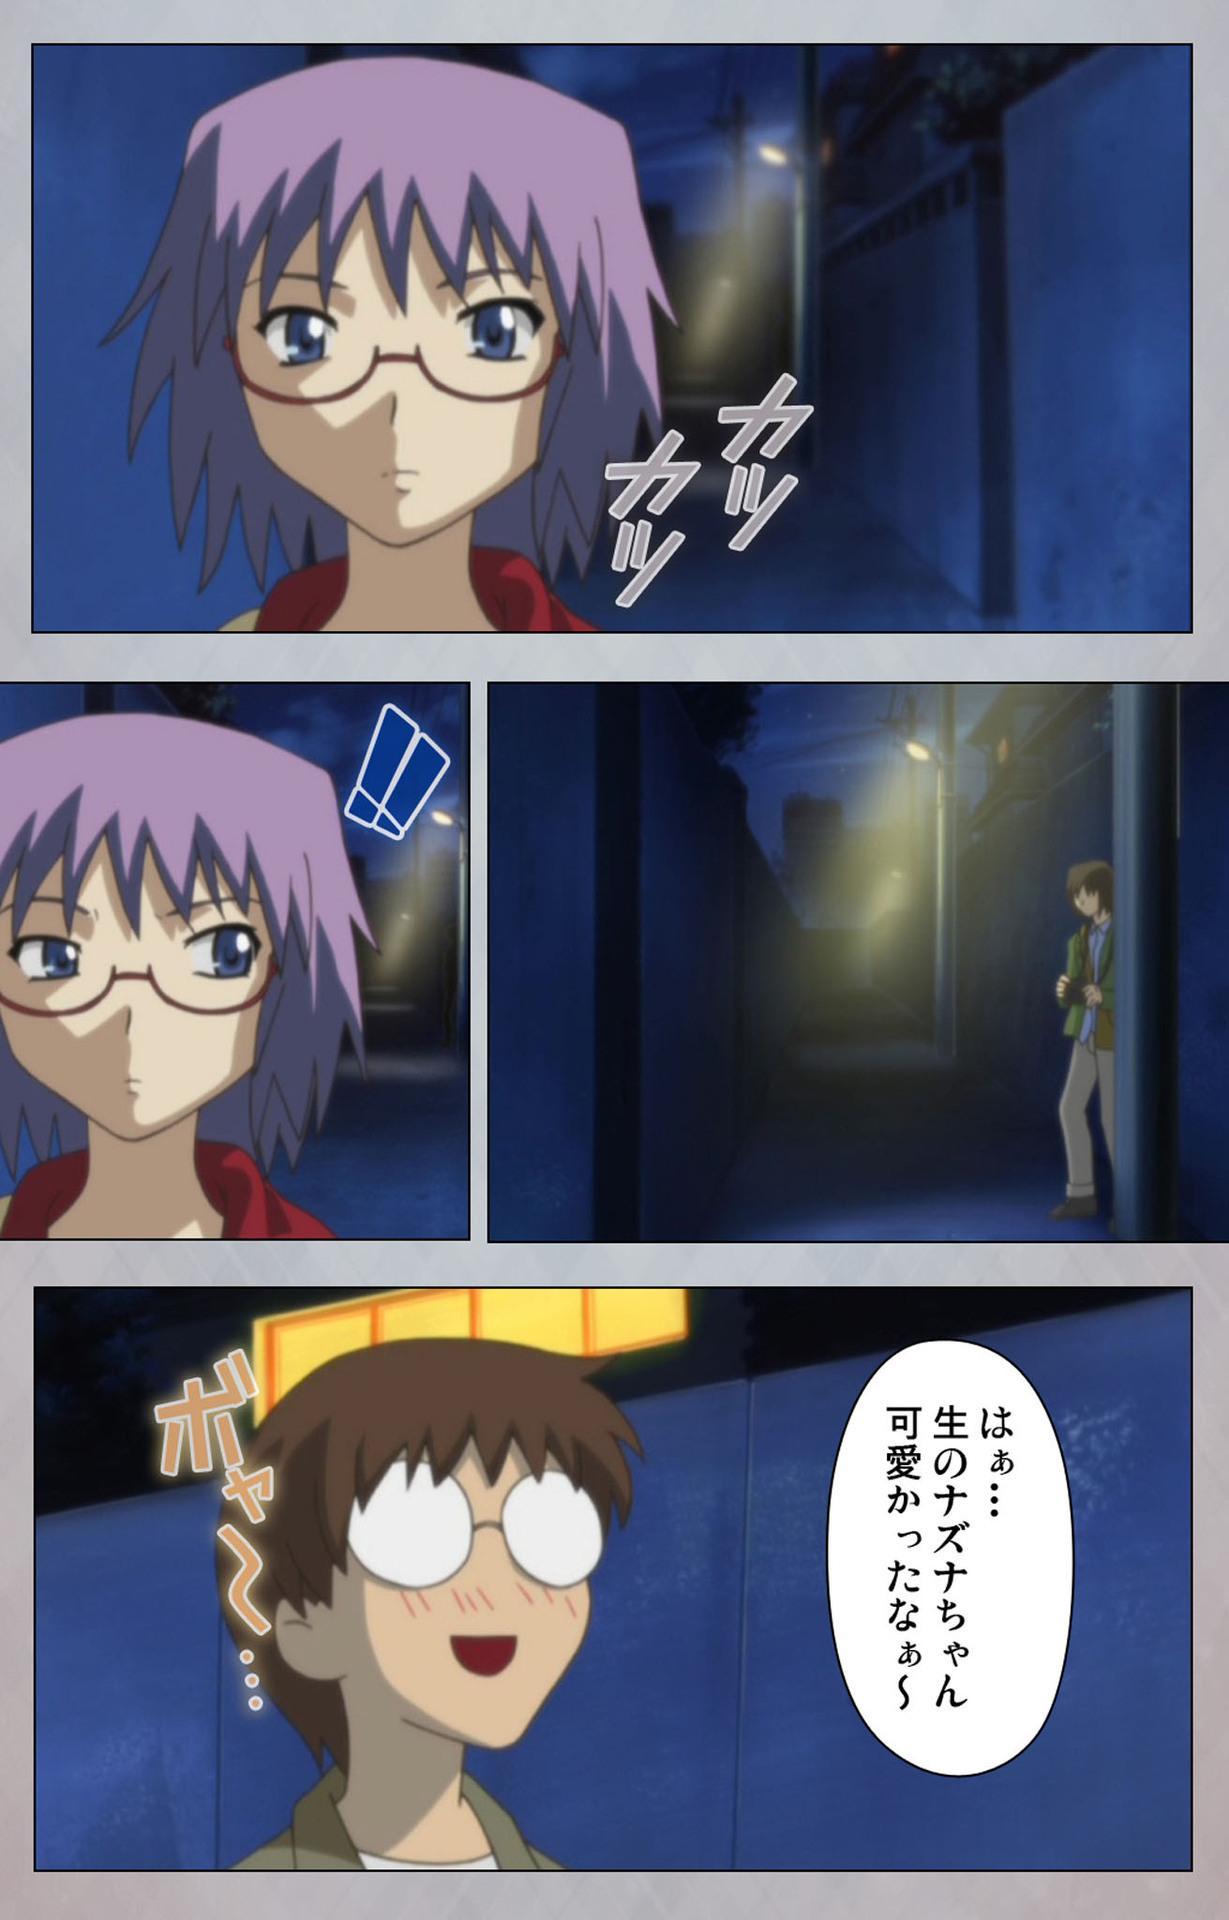 [Digital Works] [Full Color Seijin Ban] Sex Android ~Risou no Onna de Nuite yaru~ Kanzenban 13